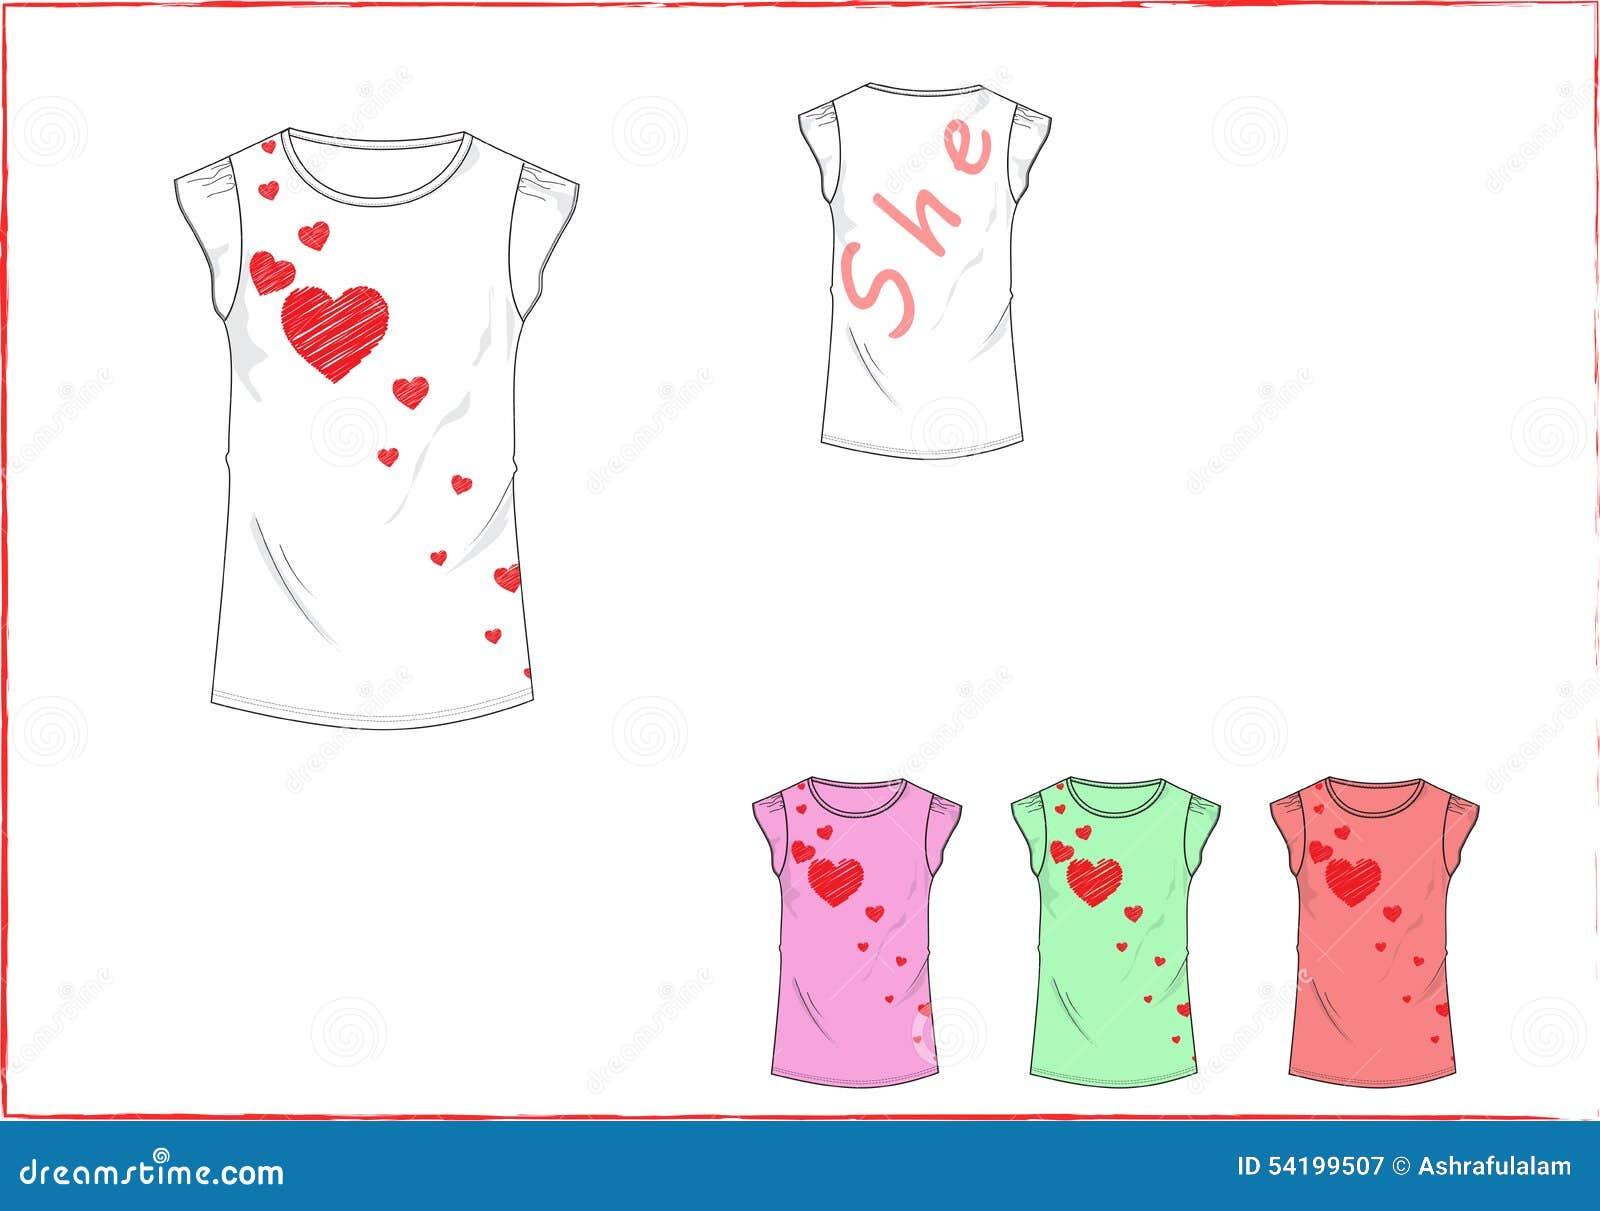 Heart design t shirt - Back Background Cap Design Front Girl Heart Lettering Little Shirt